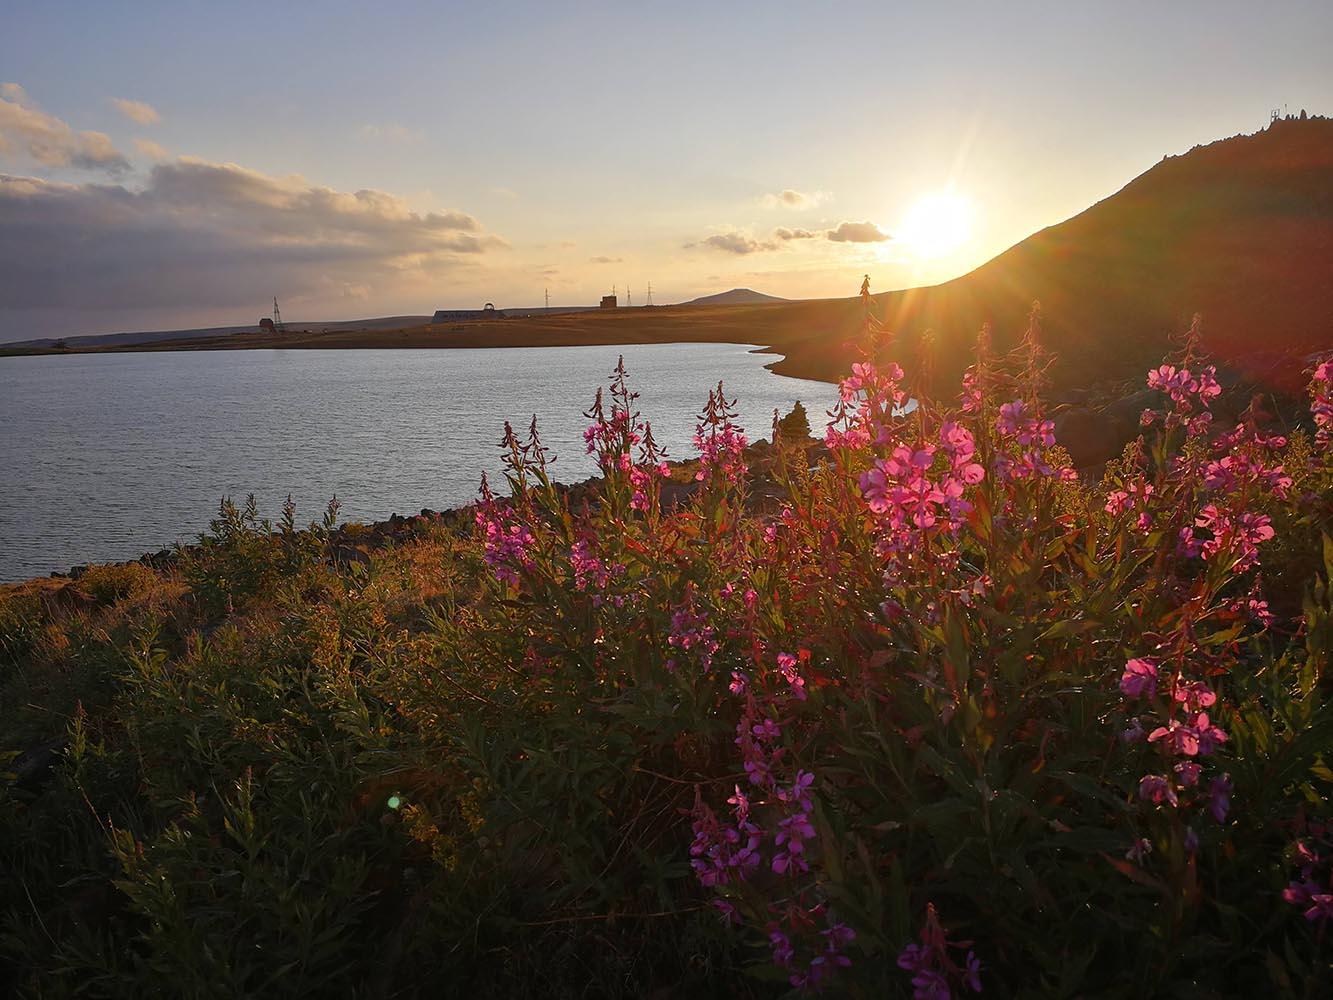 kati lich lake armenia